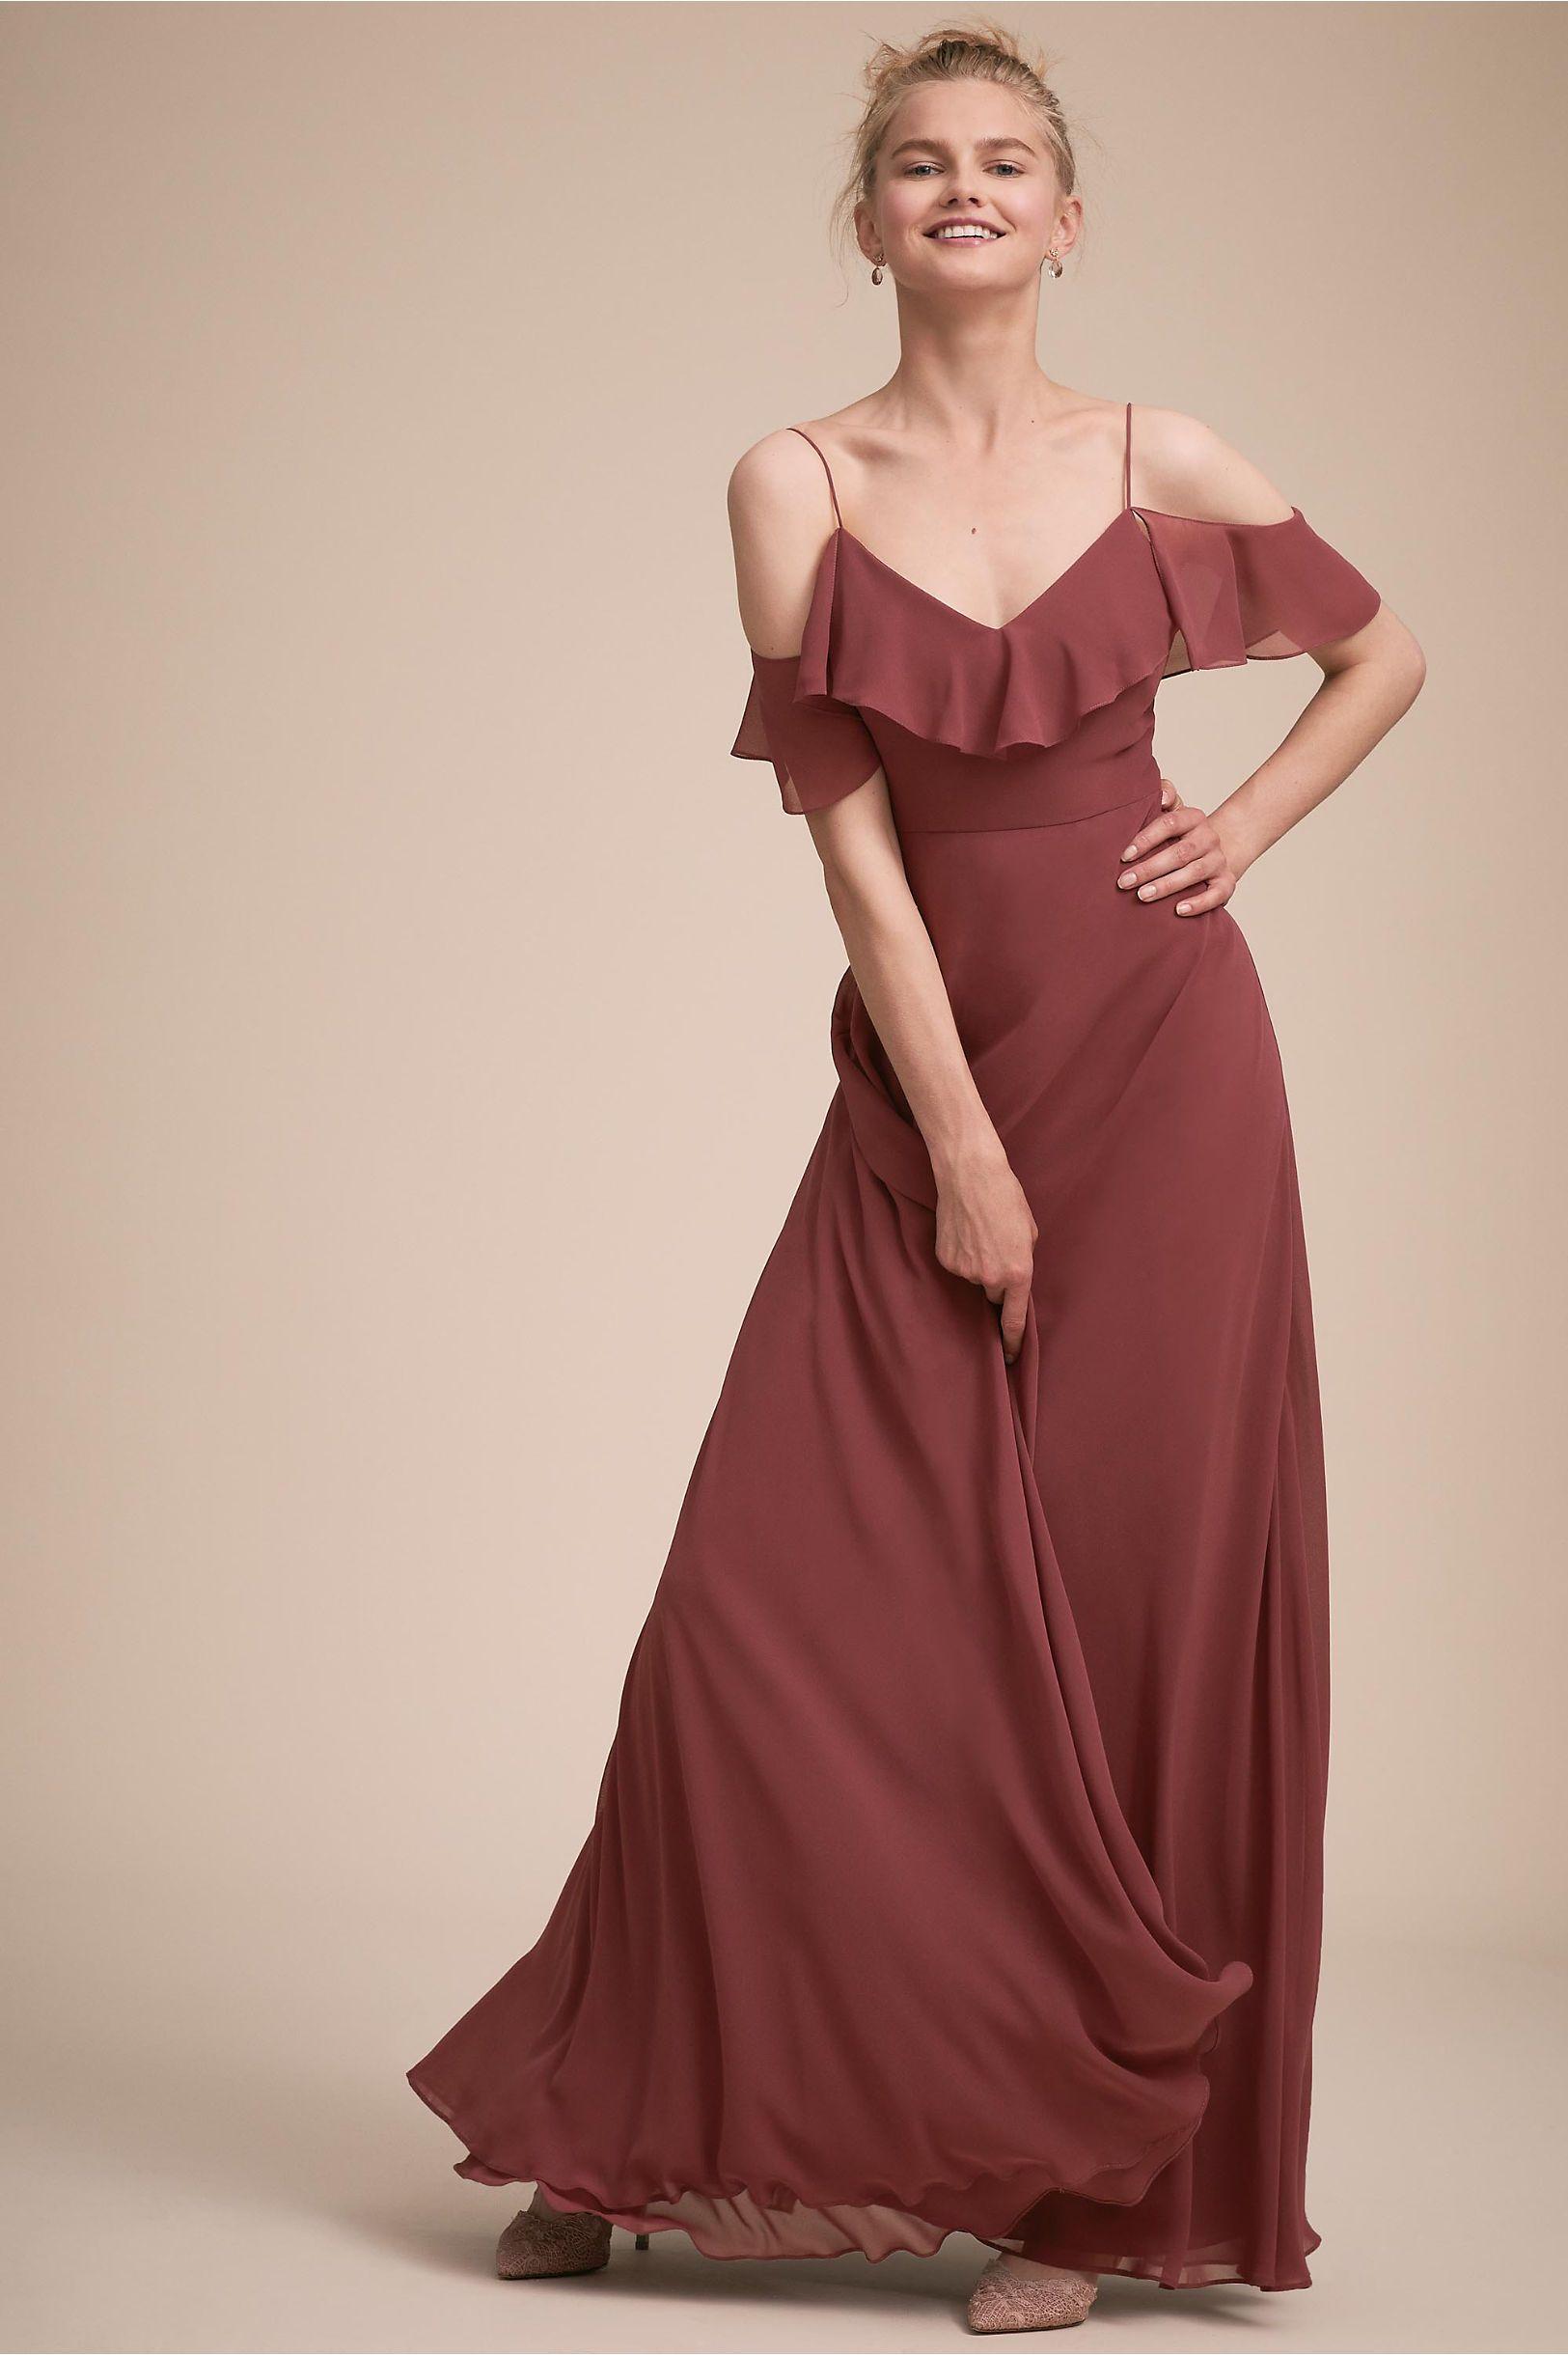 47e514448be23 BHLDN's Jenny Yoo Mila Dress in Cinnamon Rose | Shop the look ...